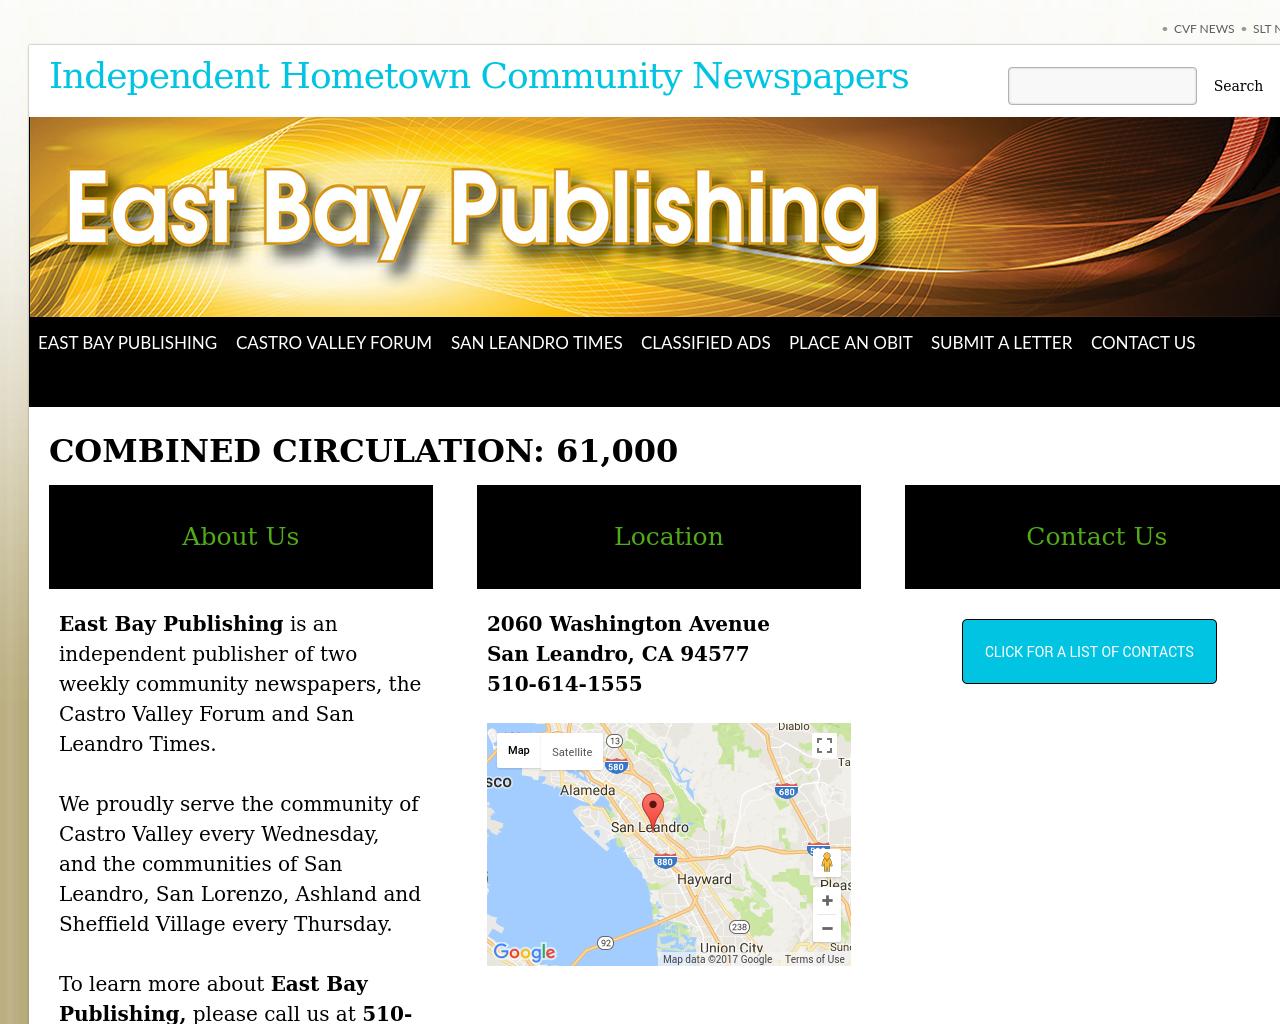 EB-Publishing-Advertising-Reviews-Pricing